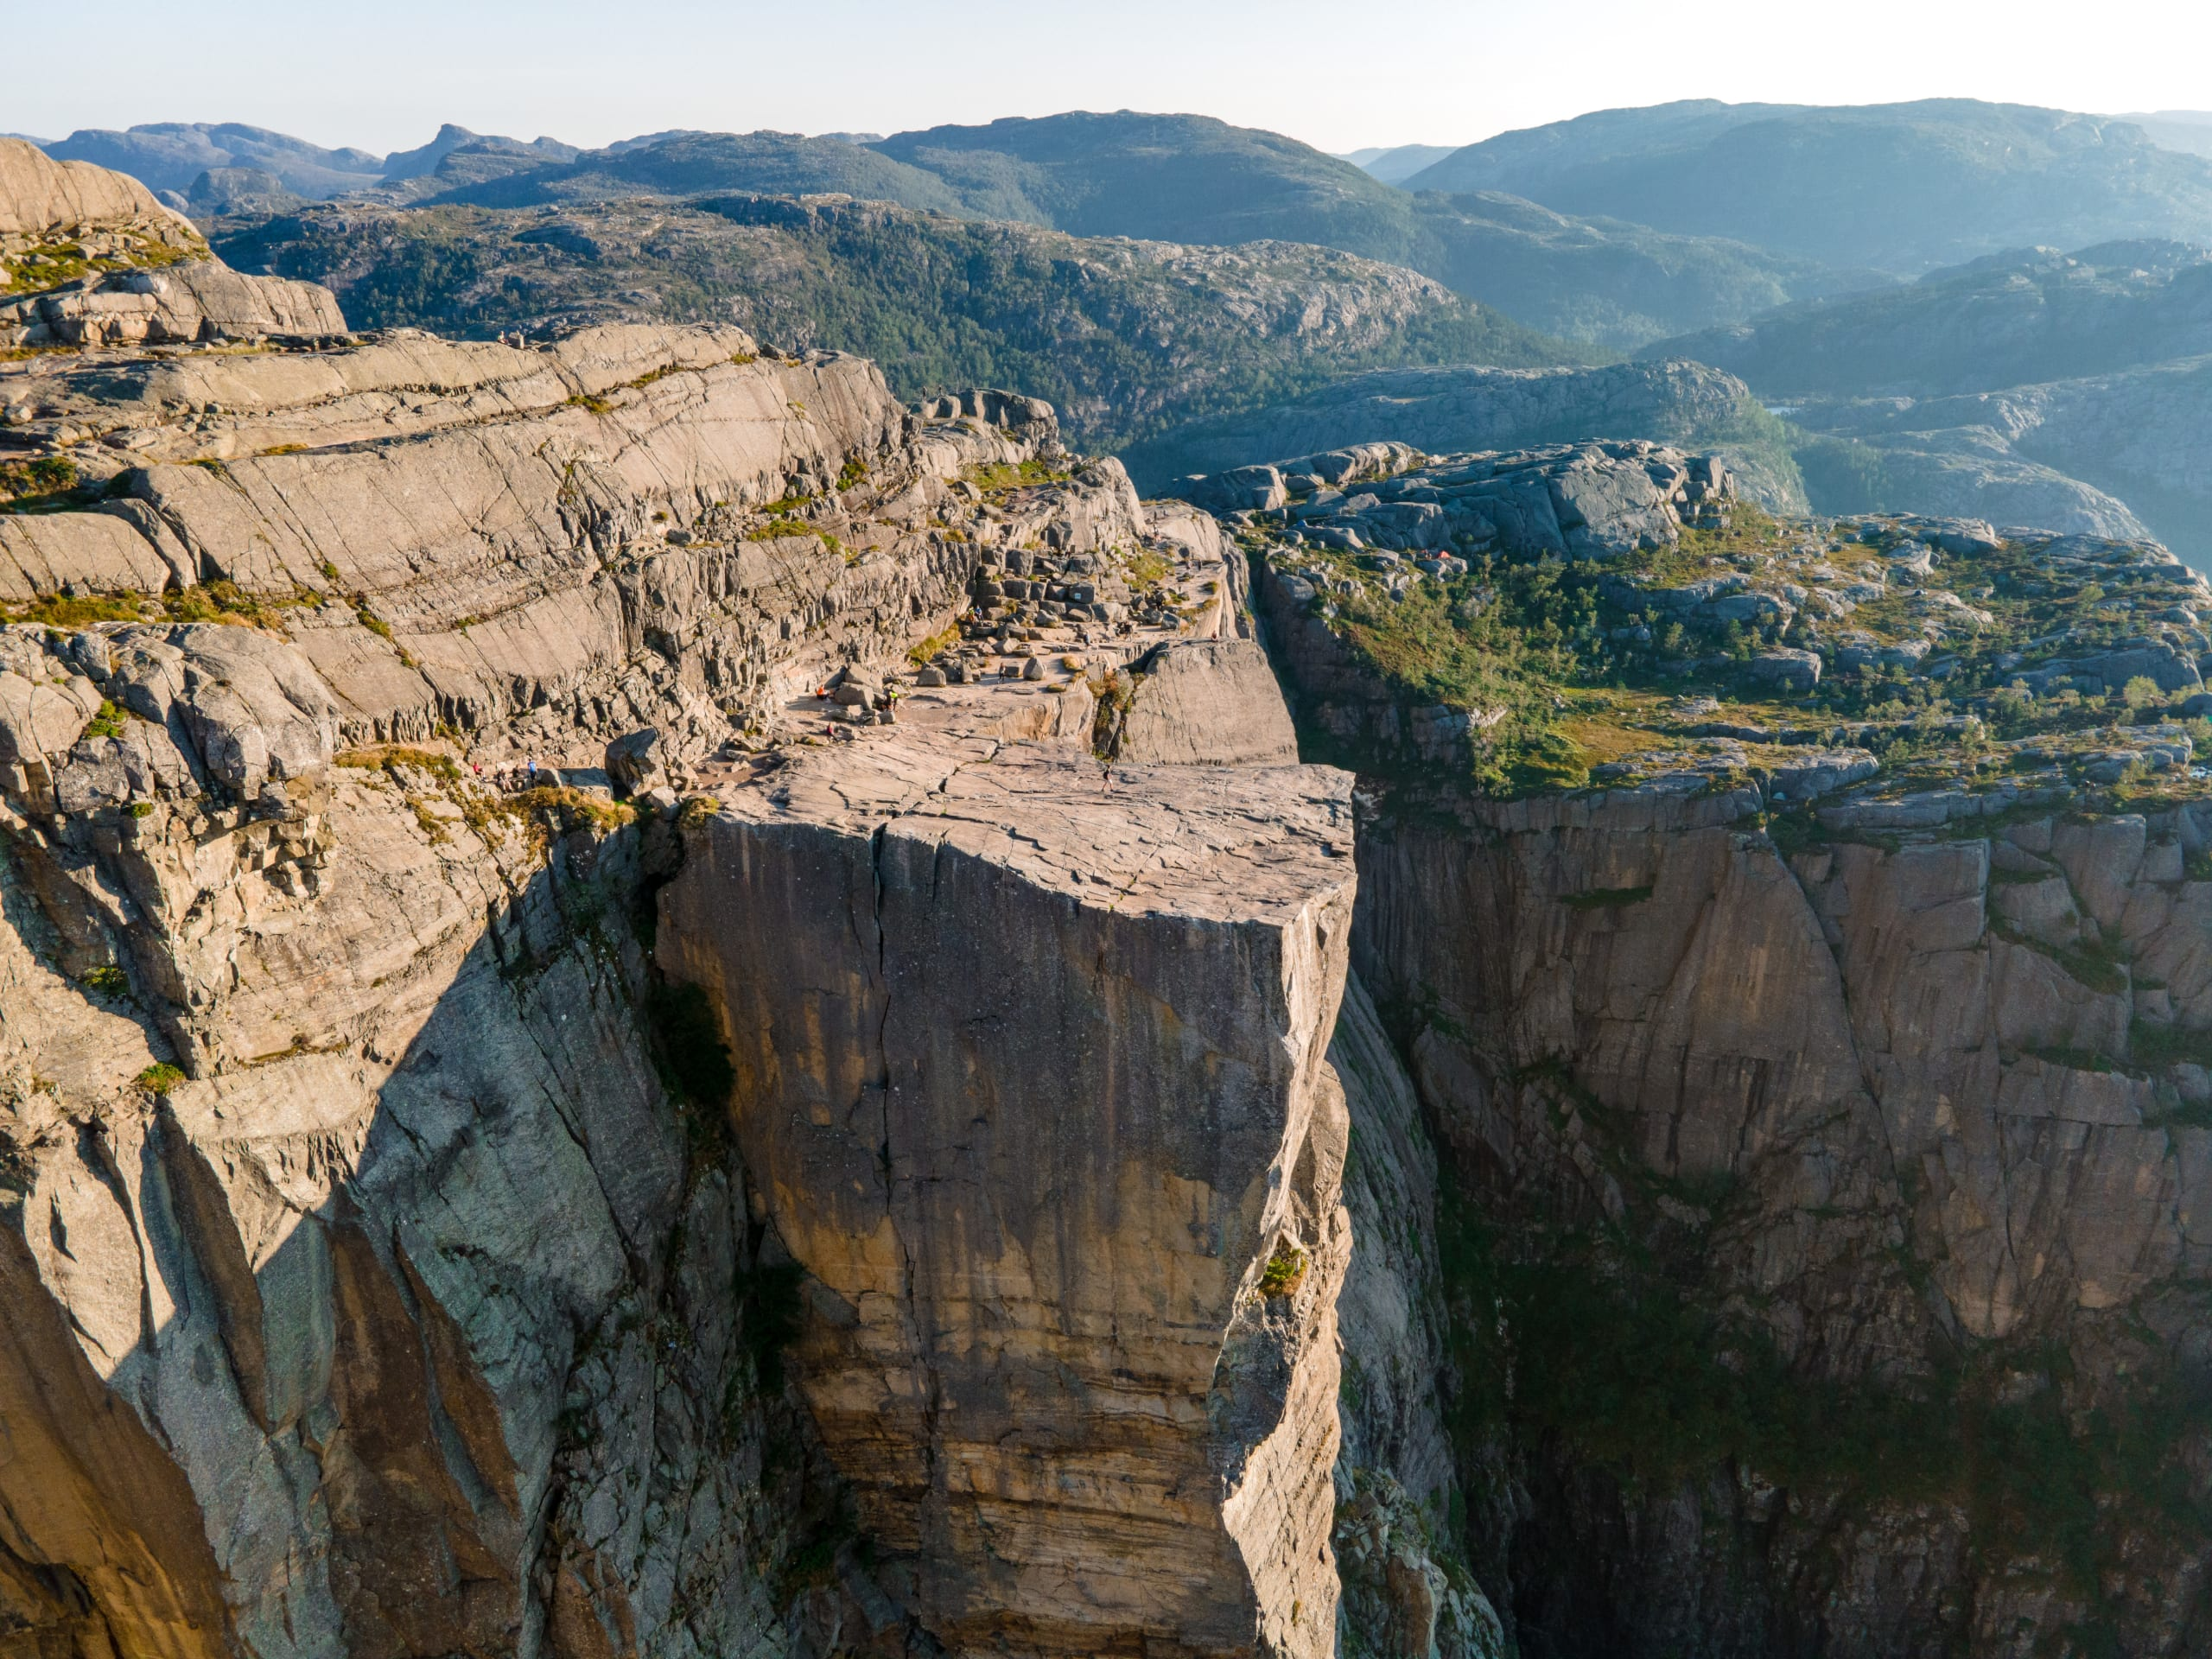 Preikestolen mountain plateau